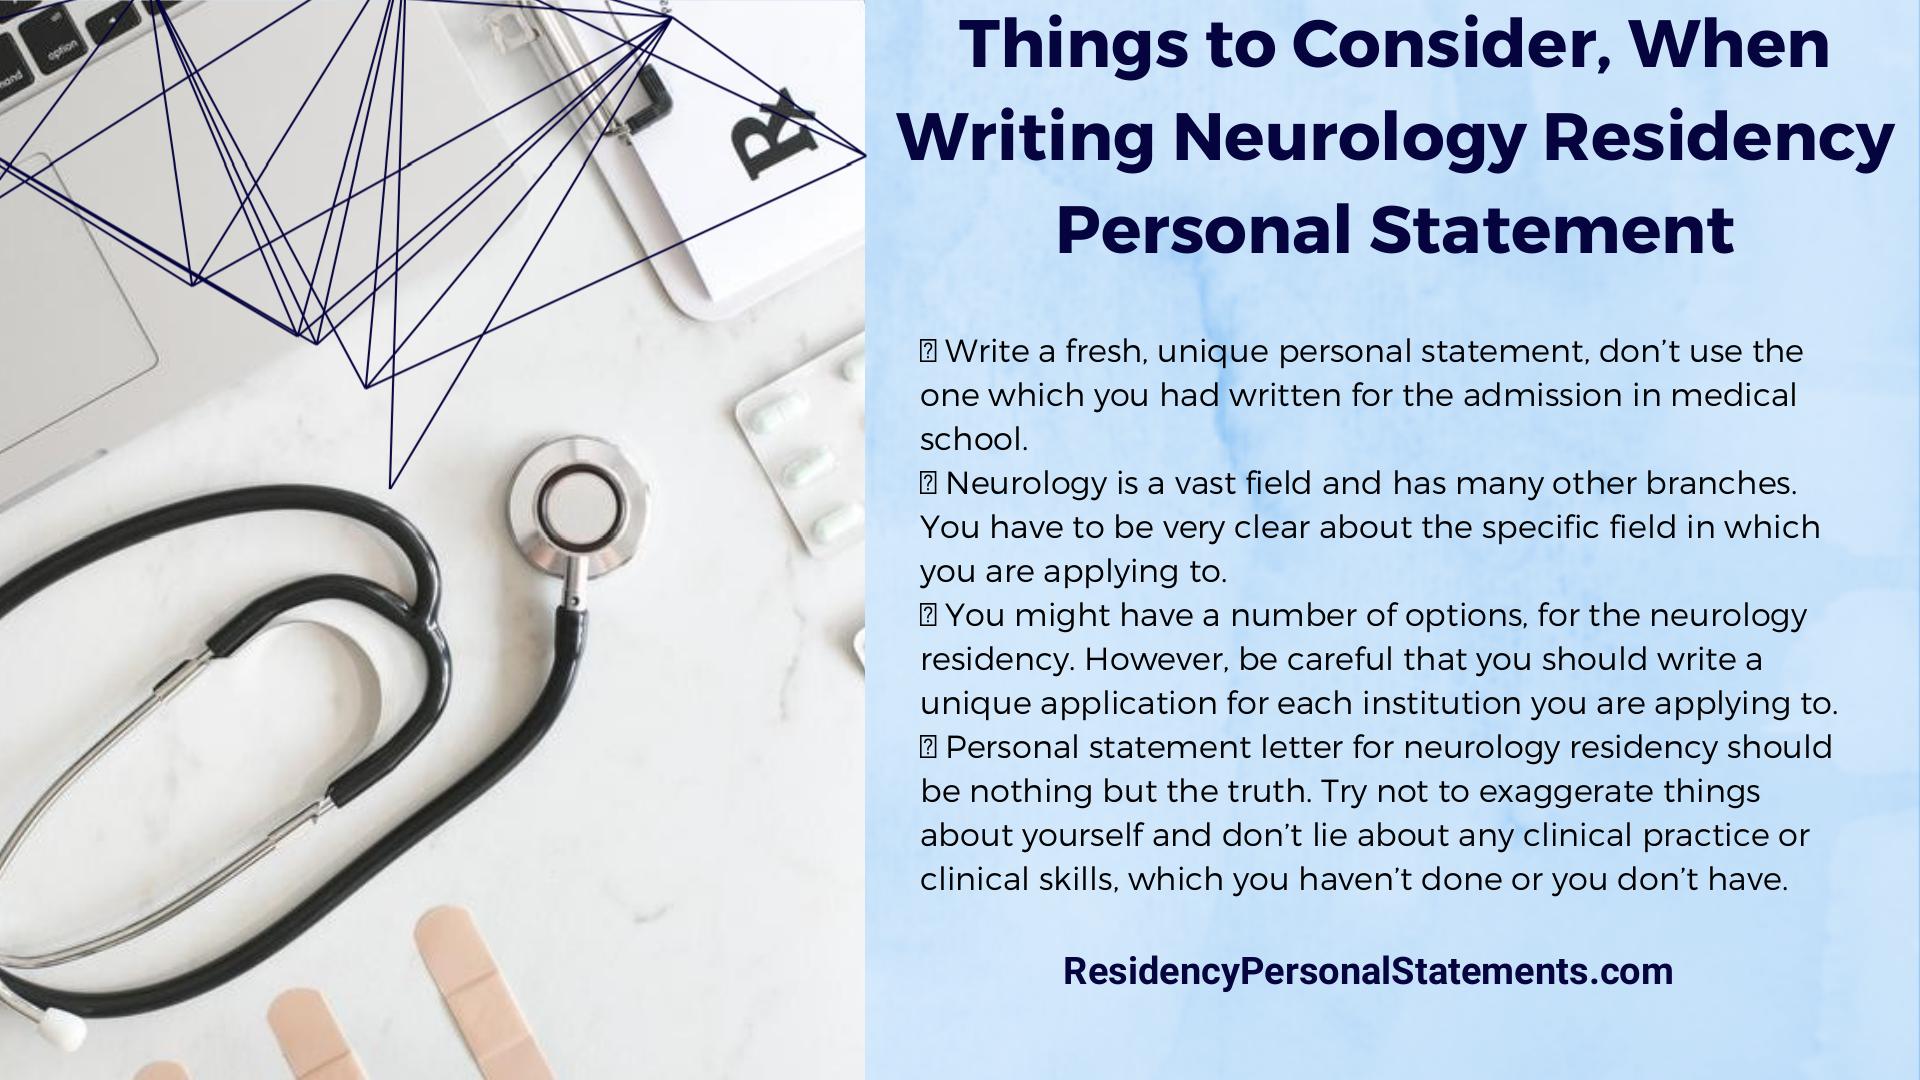 neurology residency personal statement